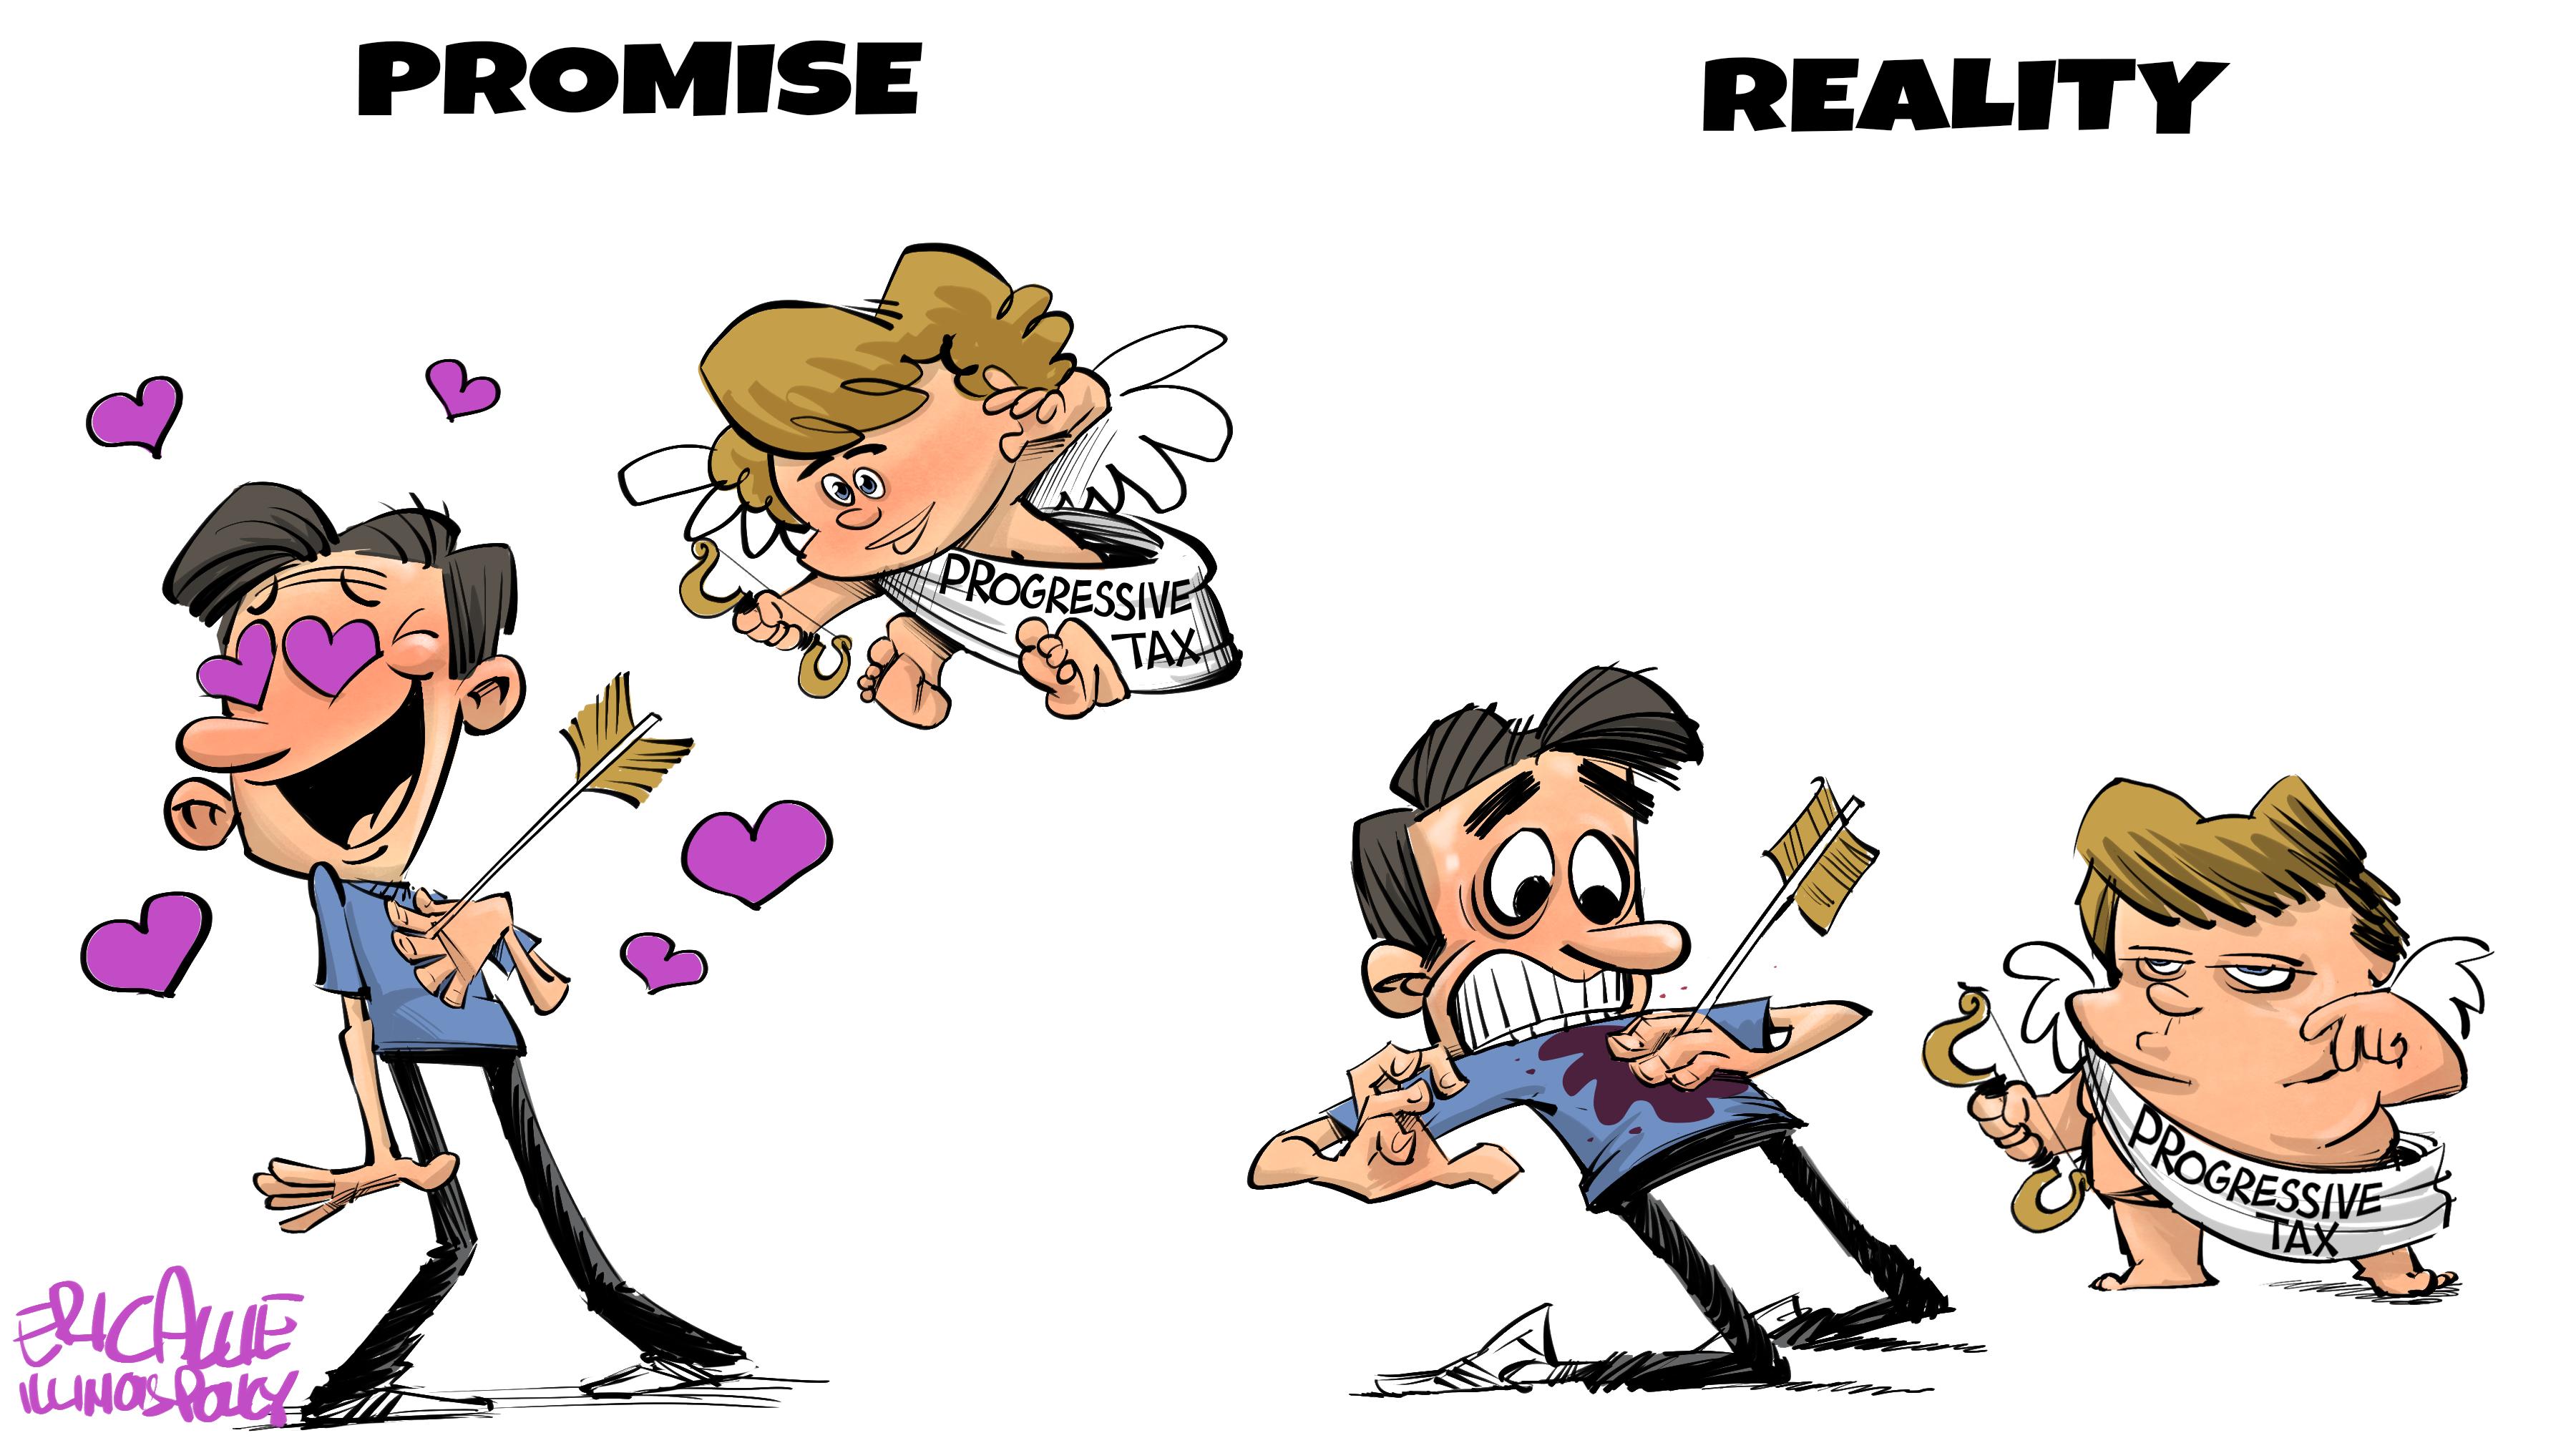 Progressive tax cupid: perception vs. reality